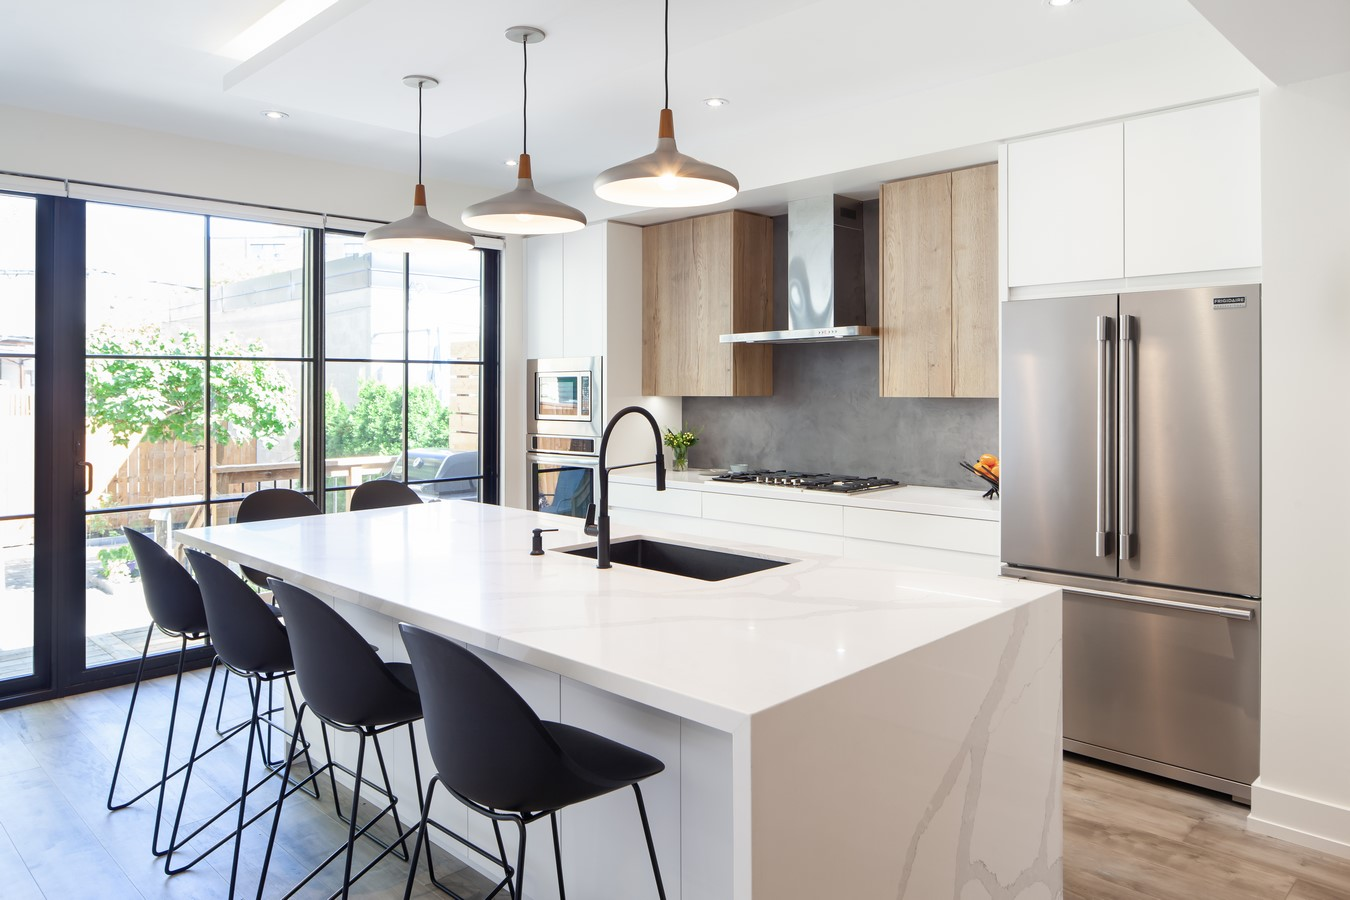 5113 Wychwood House by Joanne Myers Architect: Sheet 1